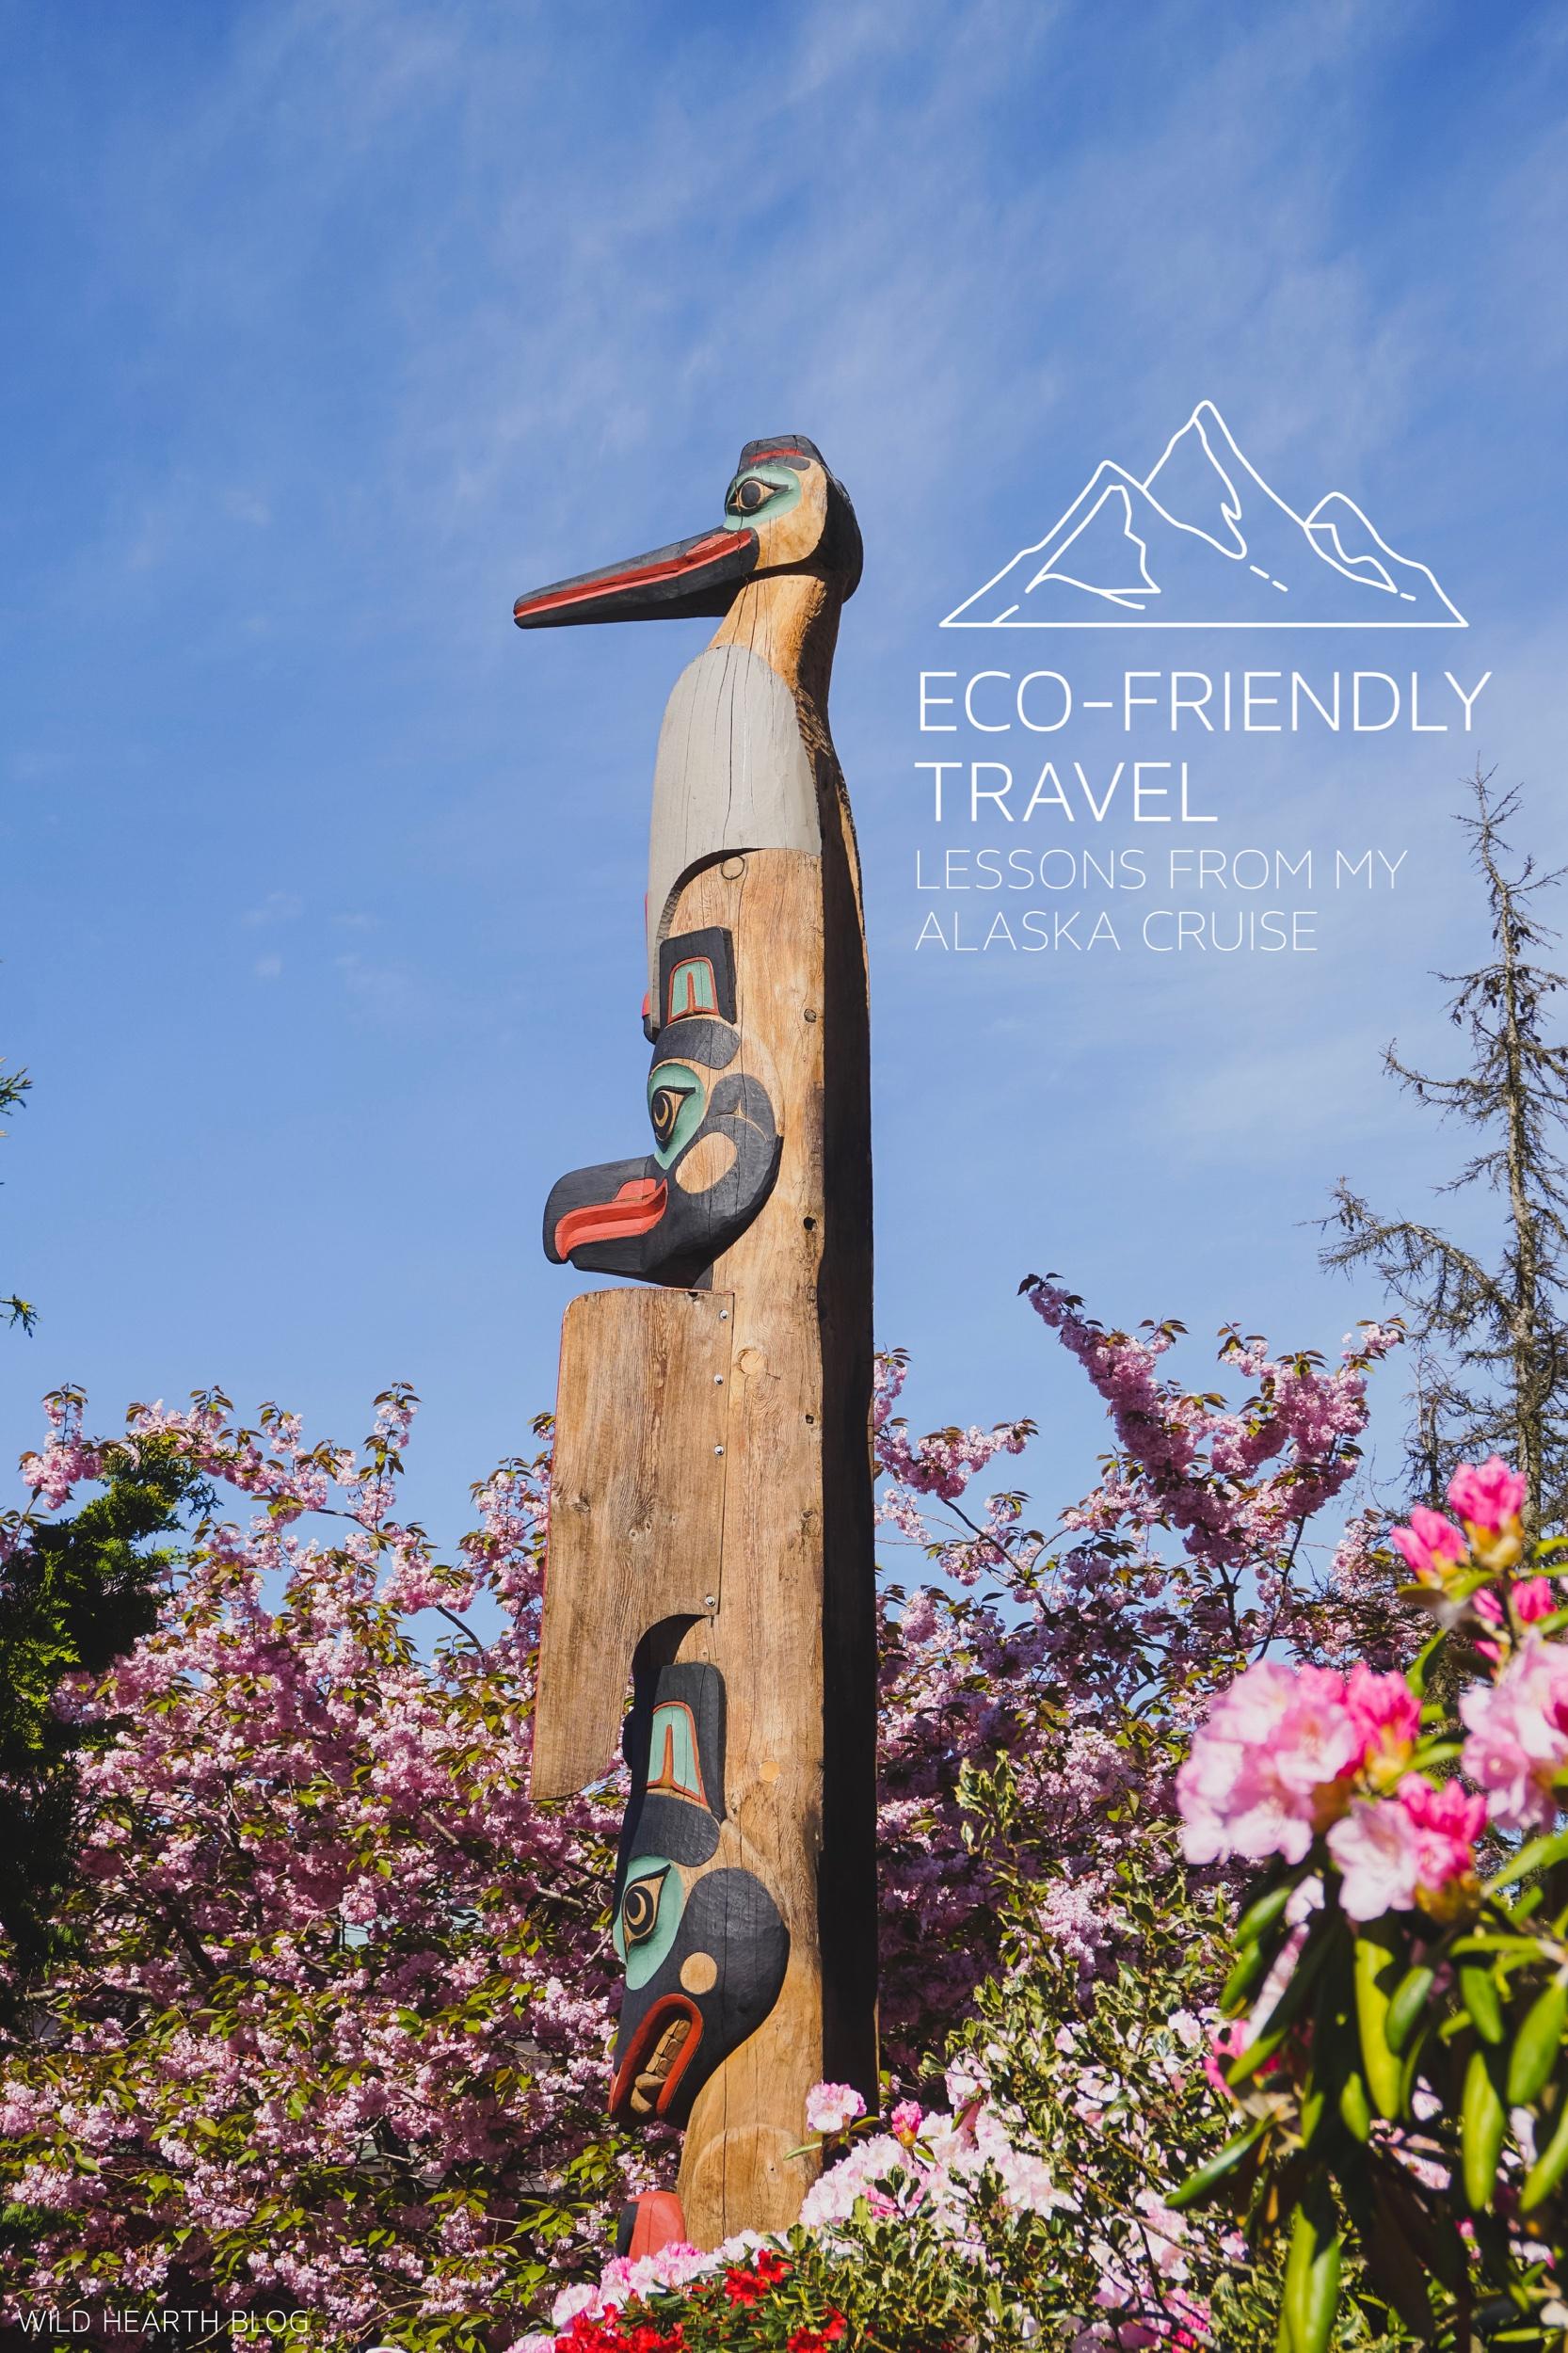 Totem_eco-friendly travel_Pinterest.jpeg